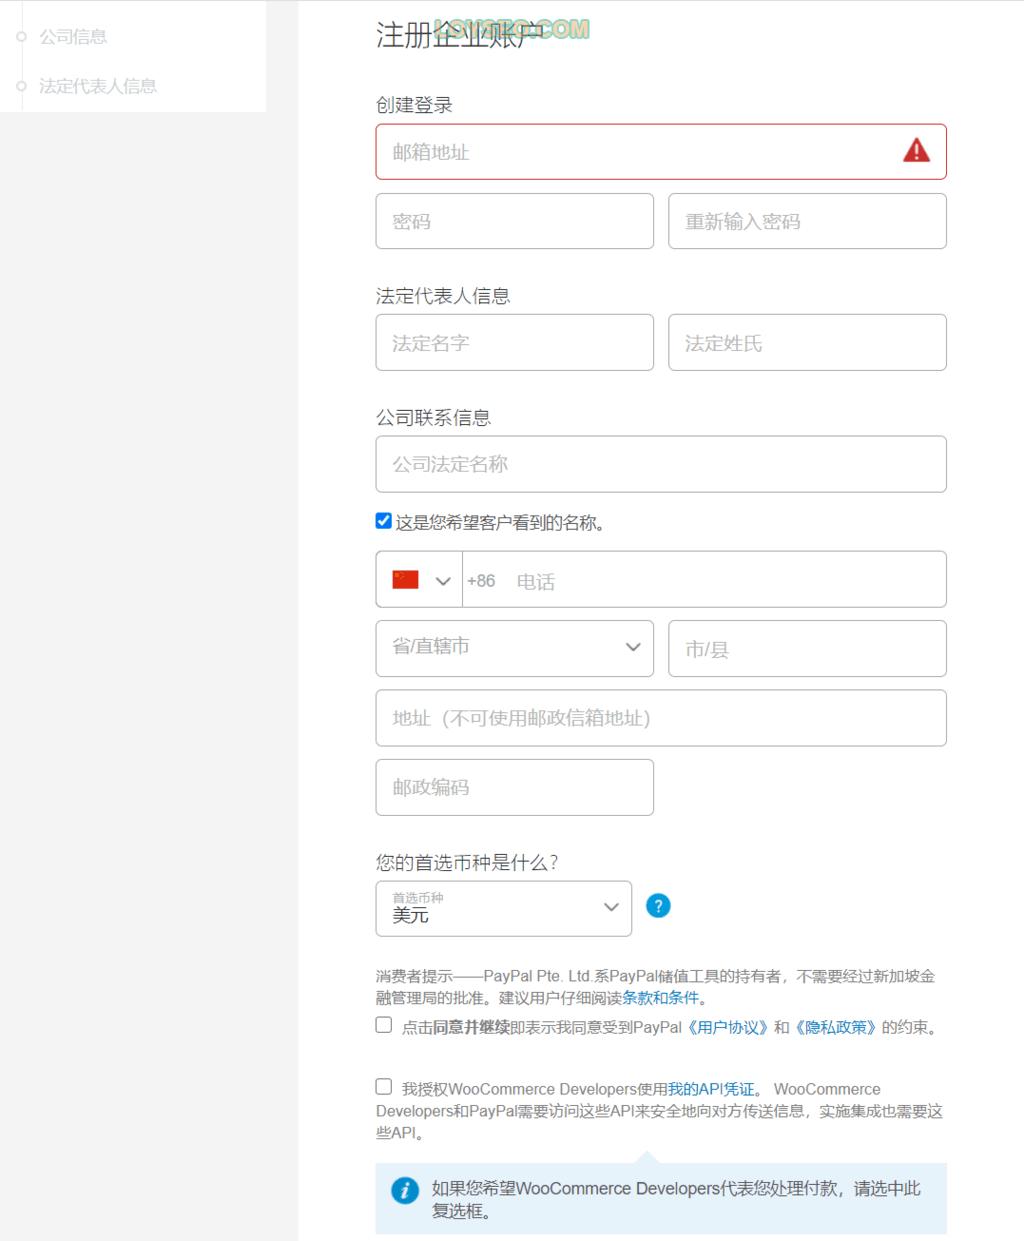 image 72 - 如何安装WooCommerce